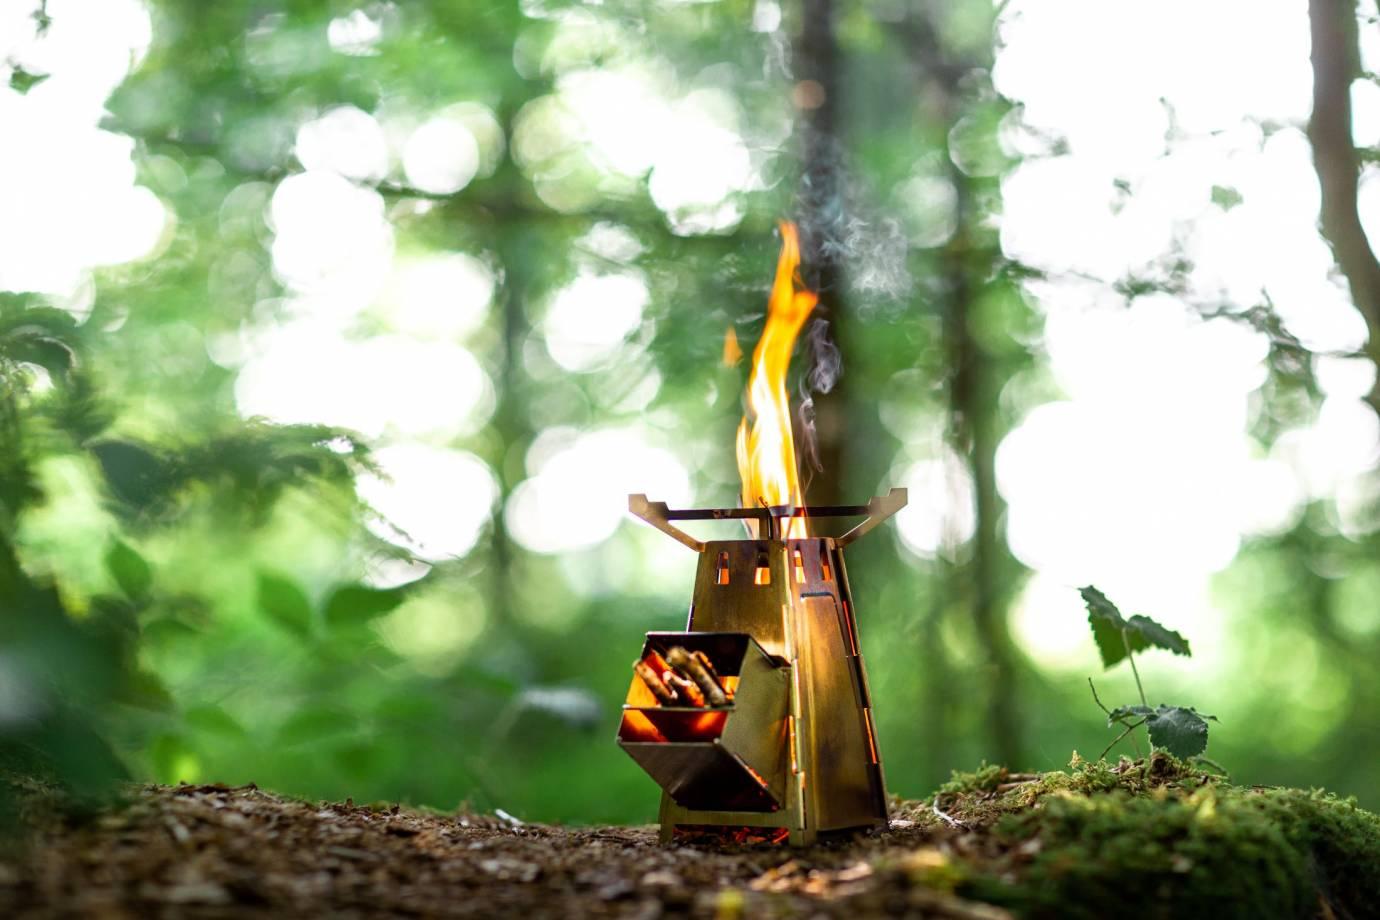 flametower compact rocket stove